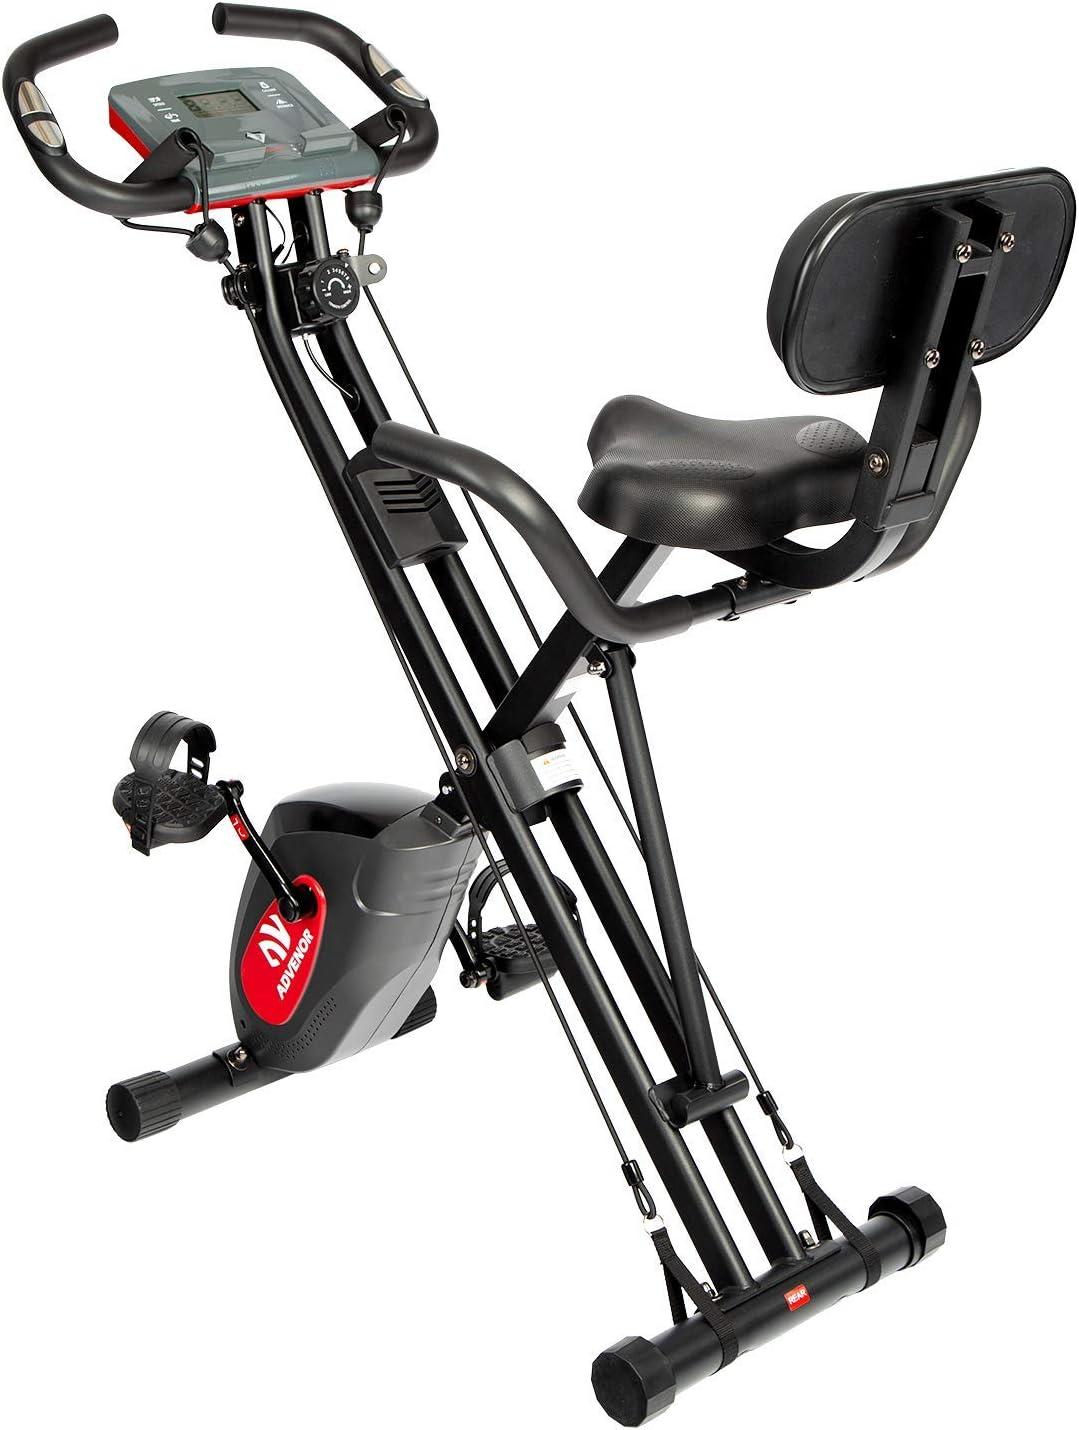 ADVENOR Exercise Bike Magnetic Bike Fitness Bike